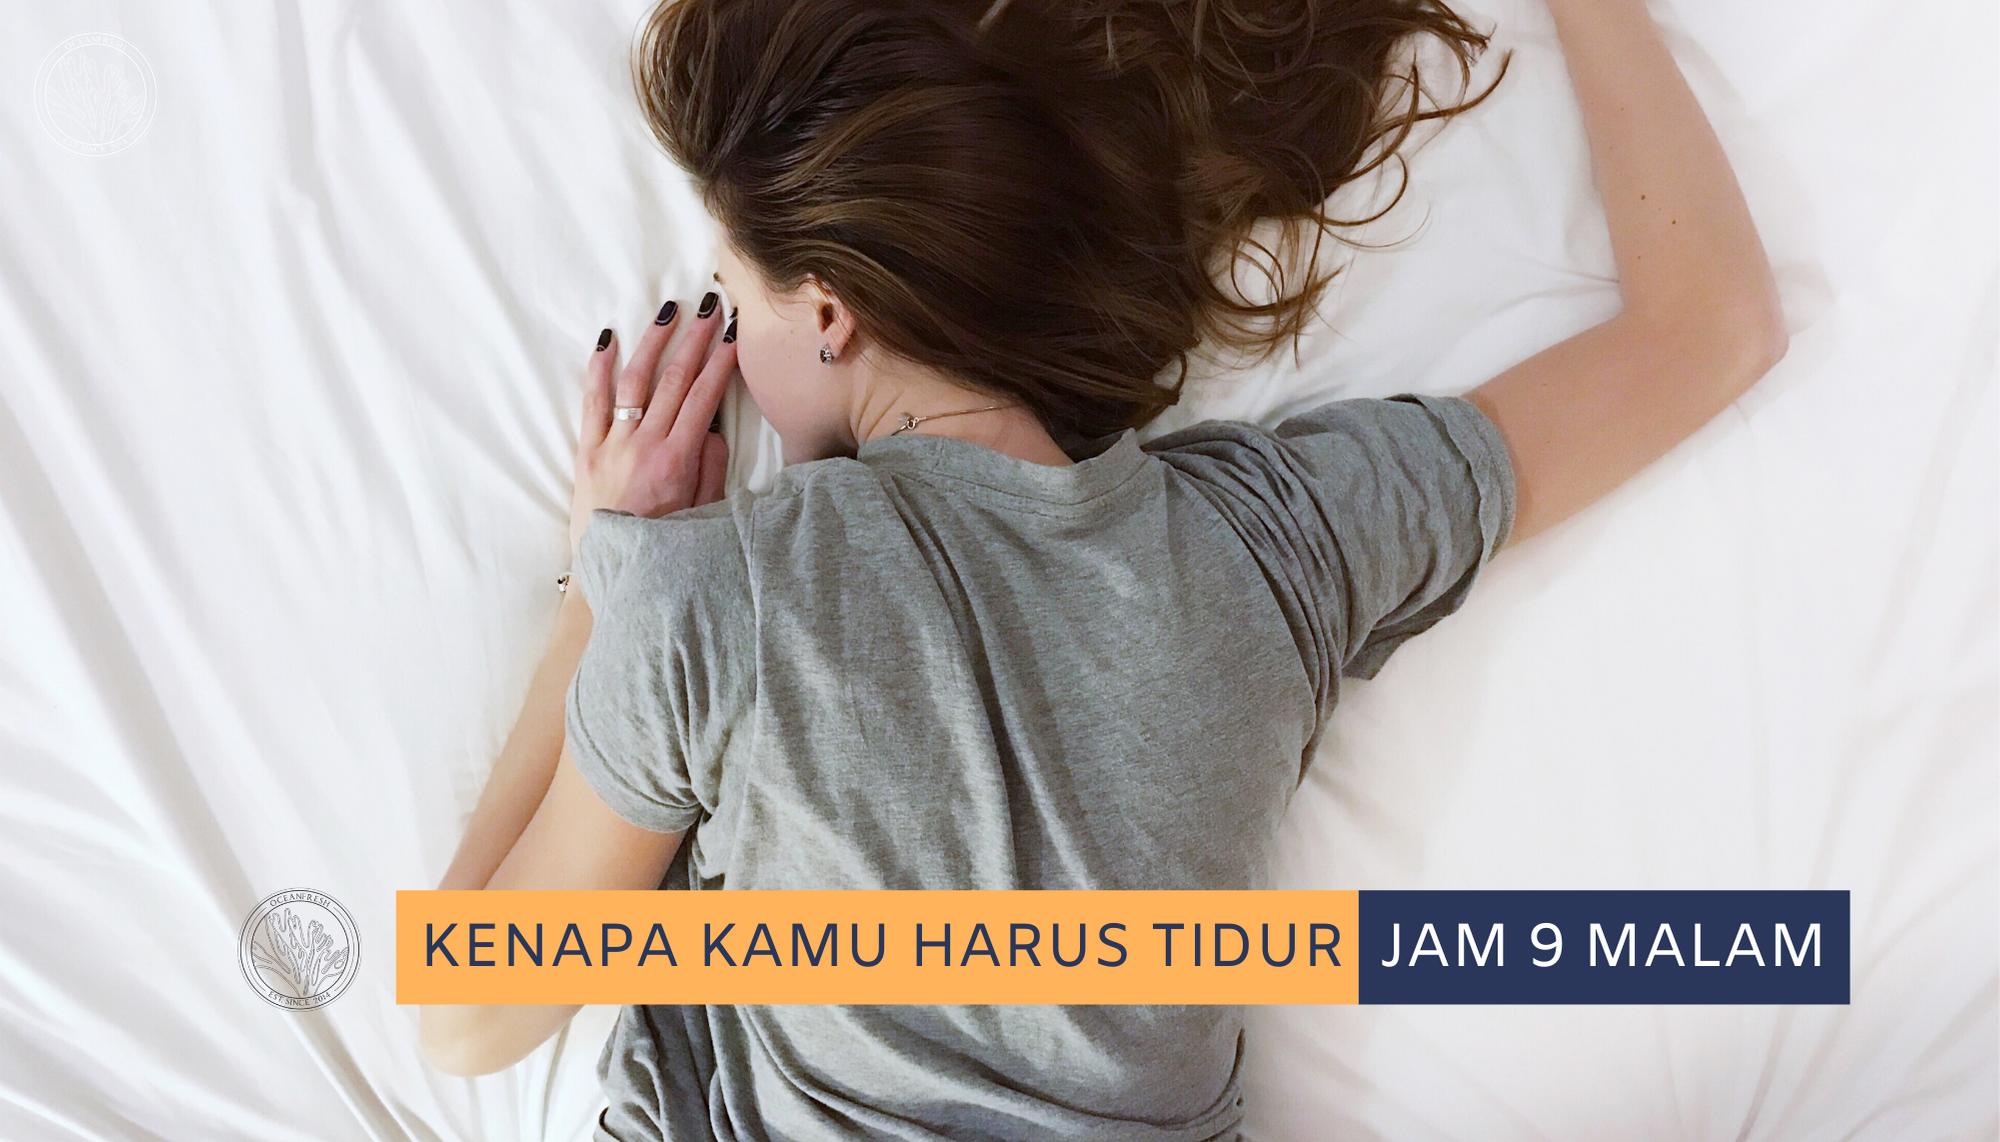 Kenapa harus tidur jam 9 malam? image